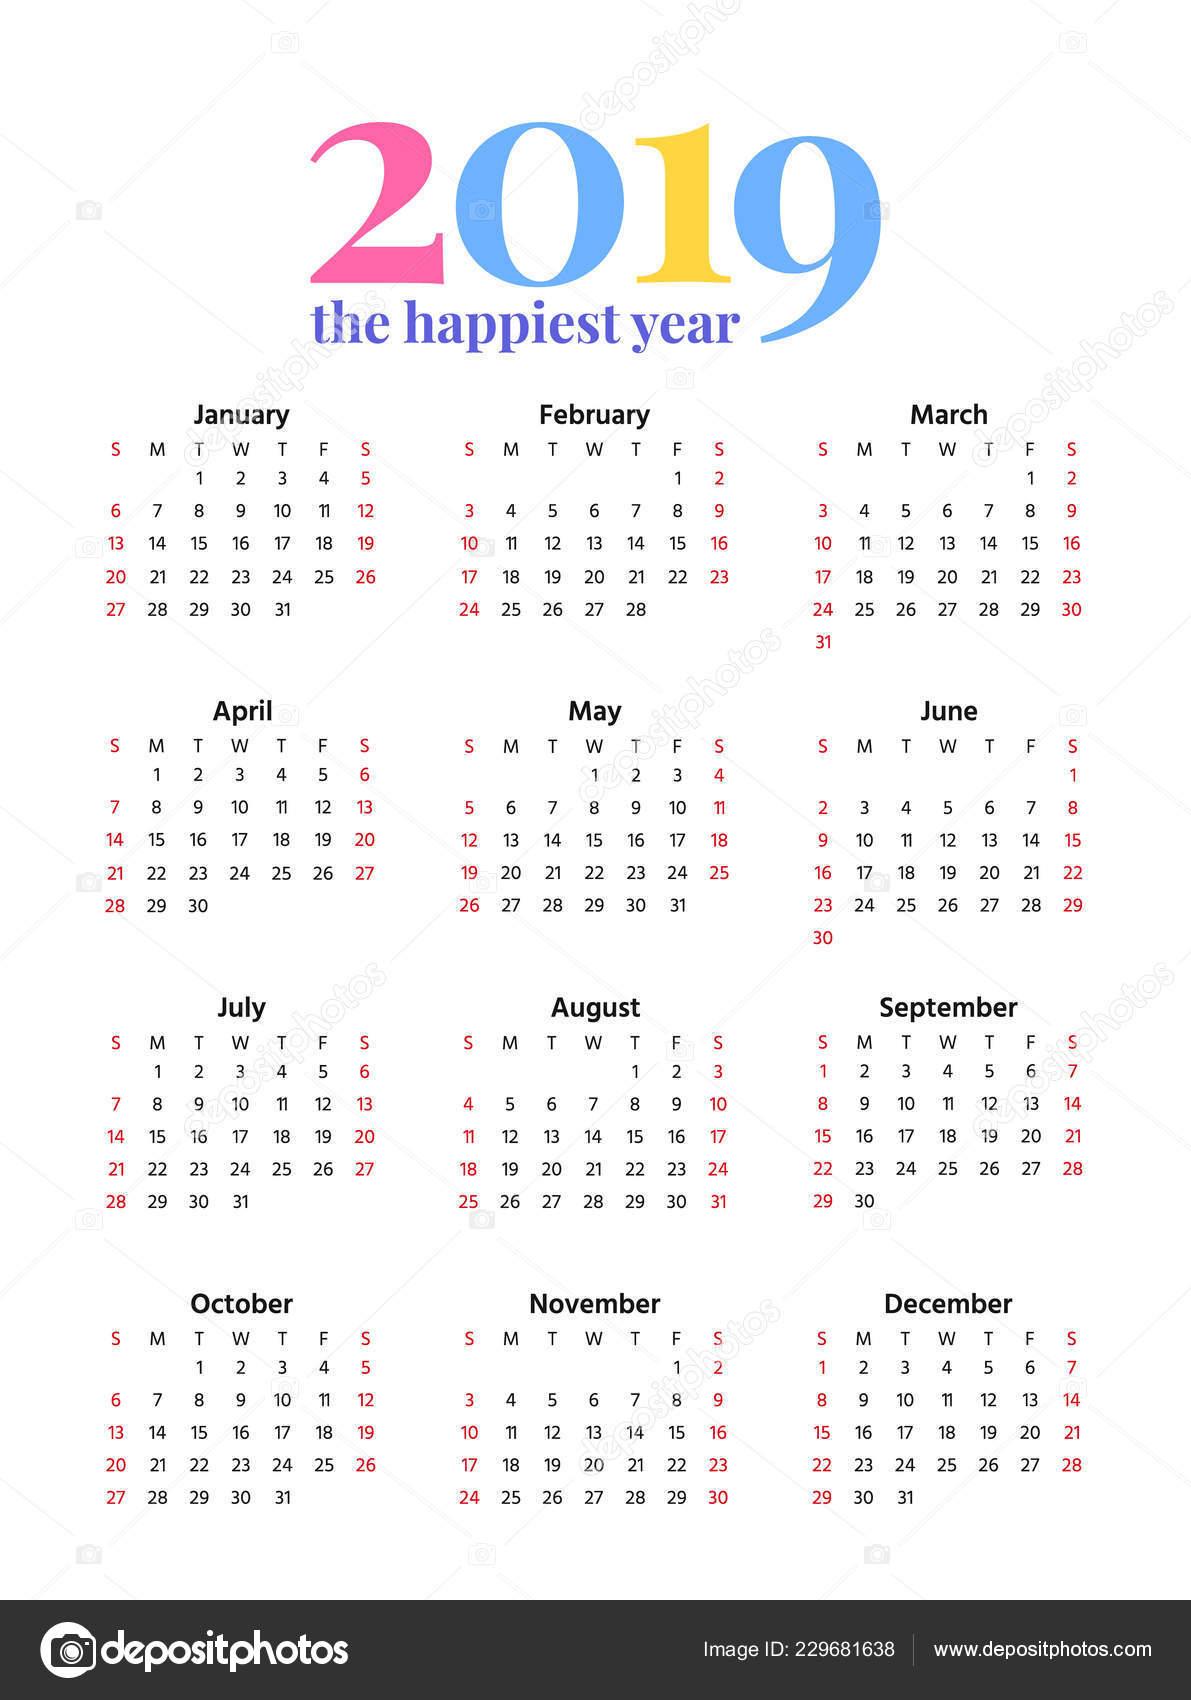 Template Calendrier 2019.2019 Calendar Vector Stationery 2019 Year Vertical Pocket